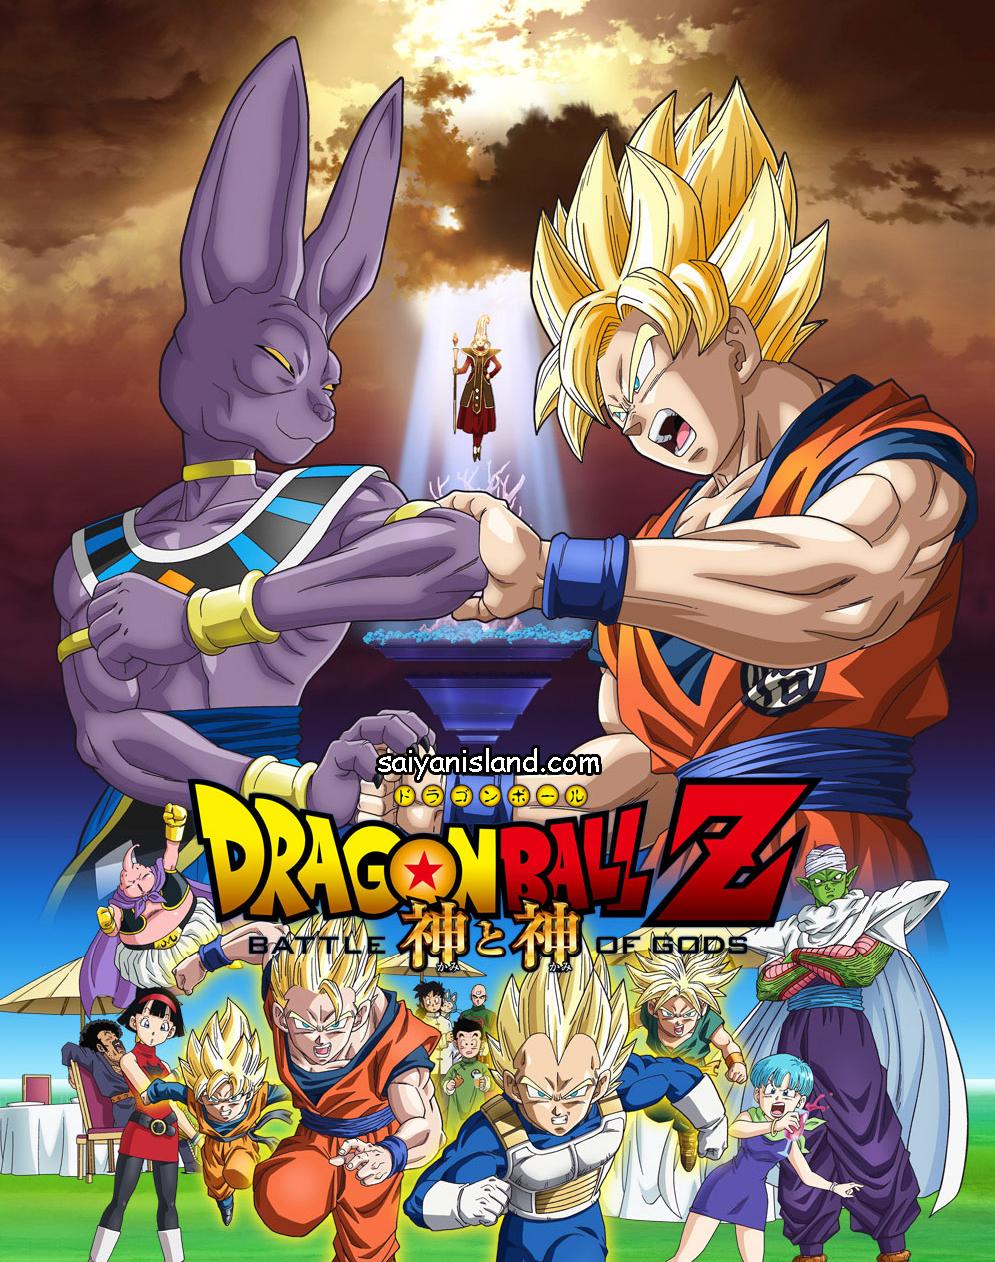 Dragon Ball Z : Battle of Gods Streaming vk filmze